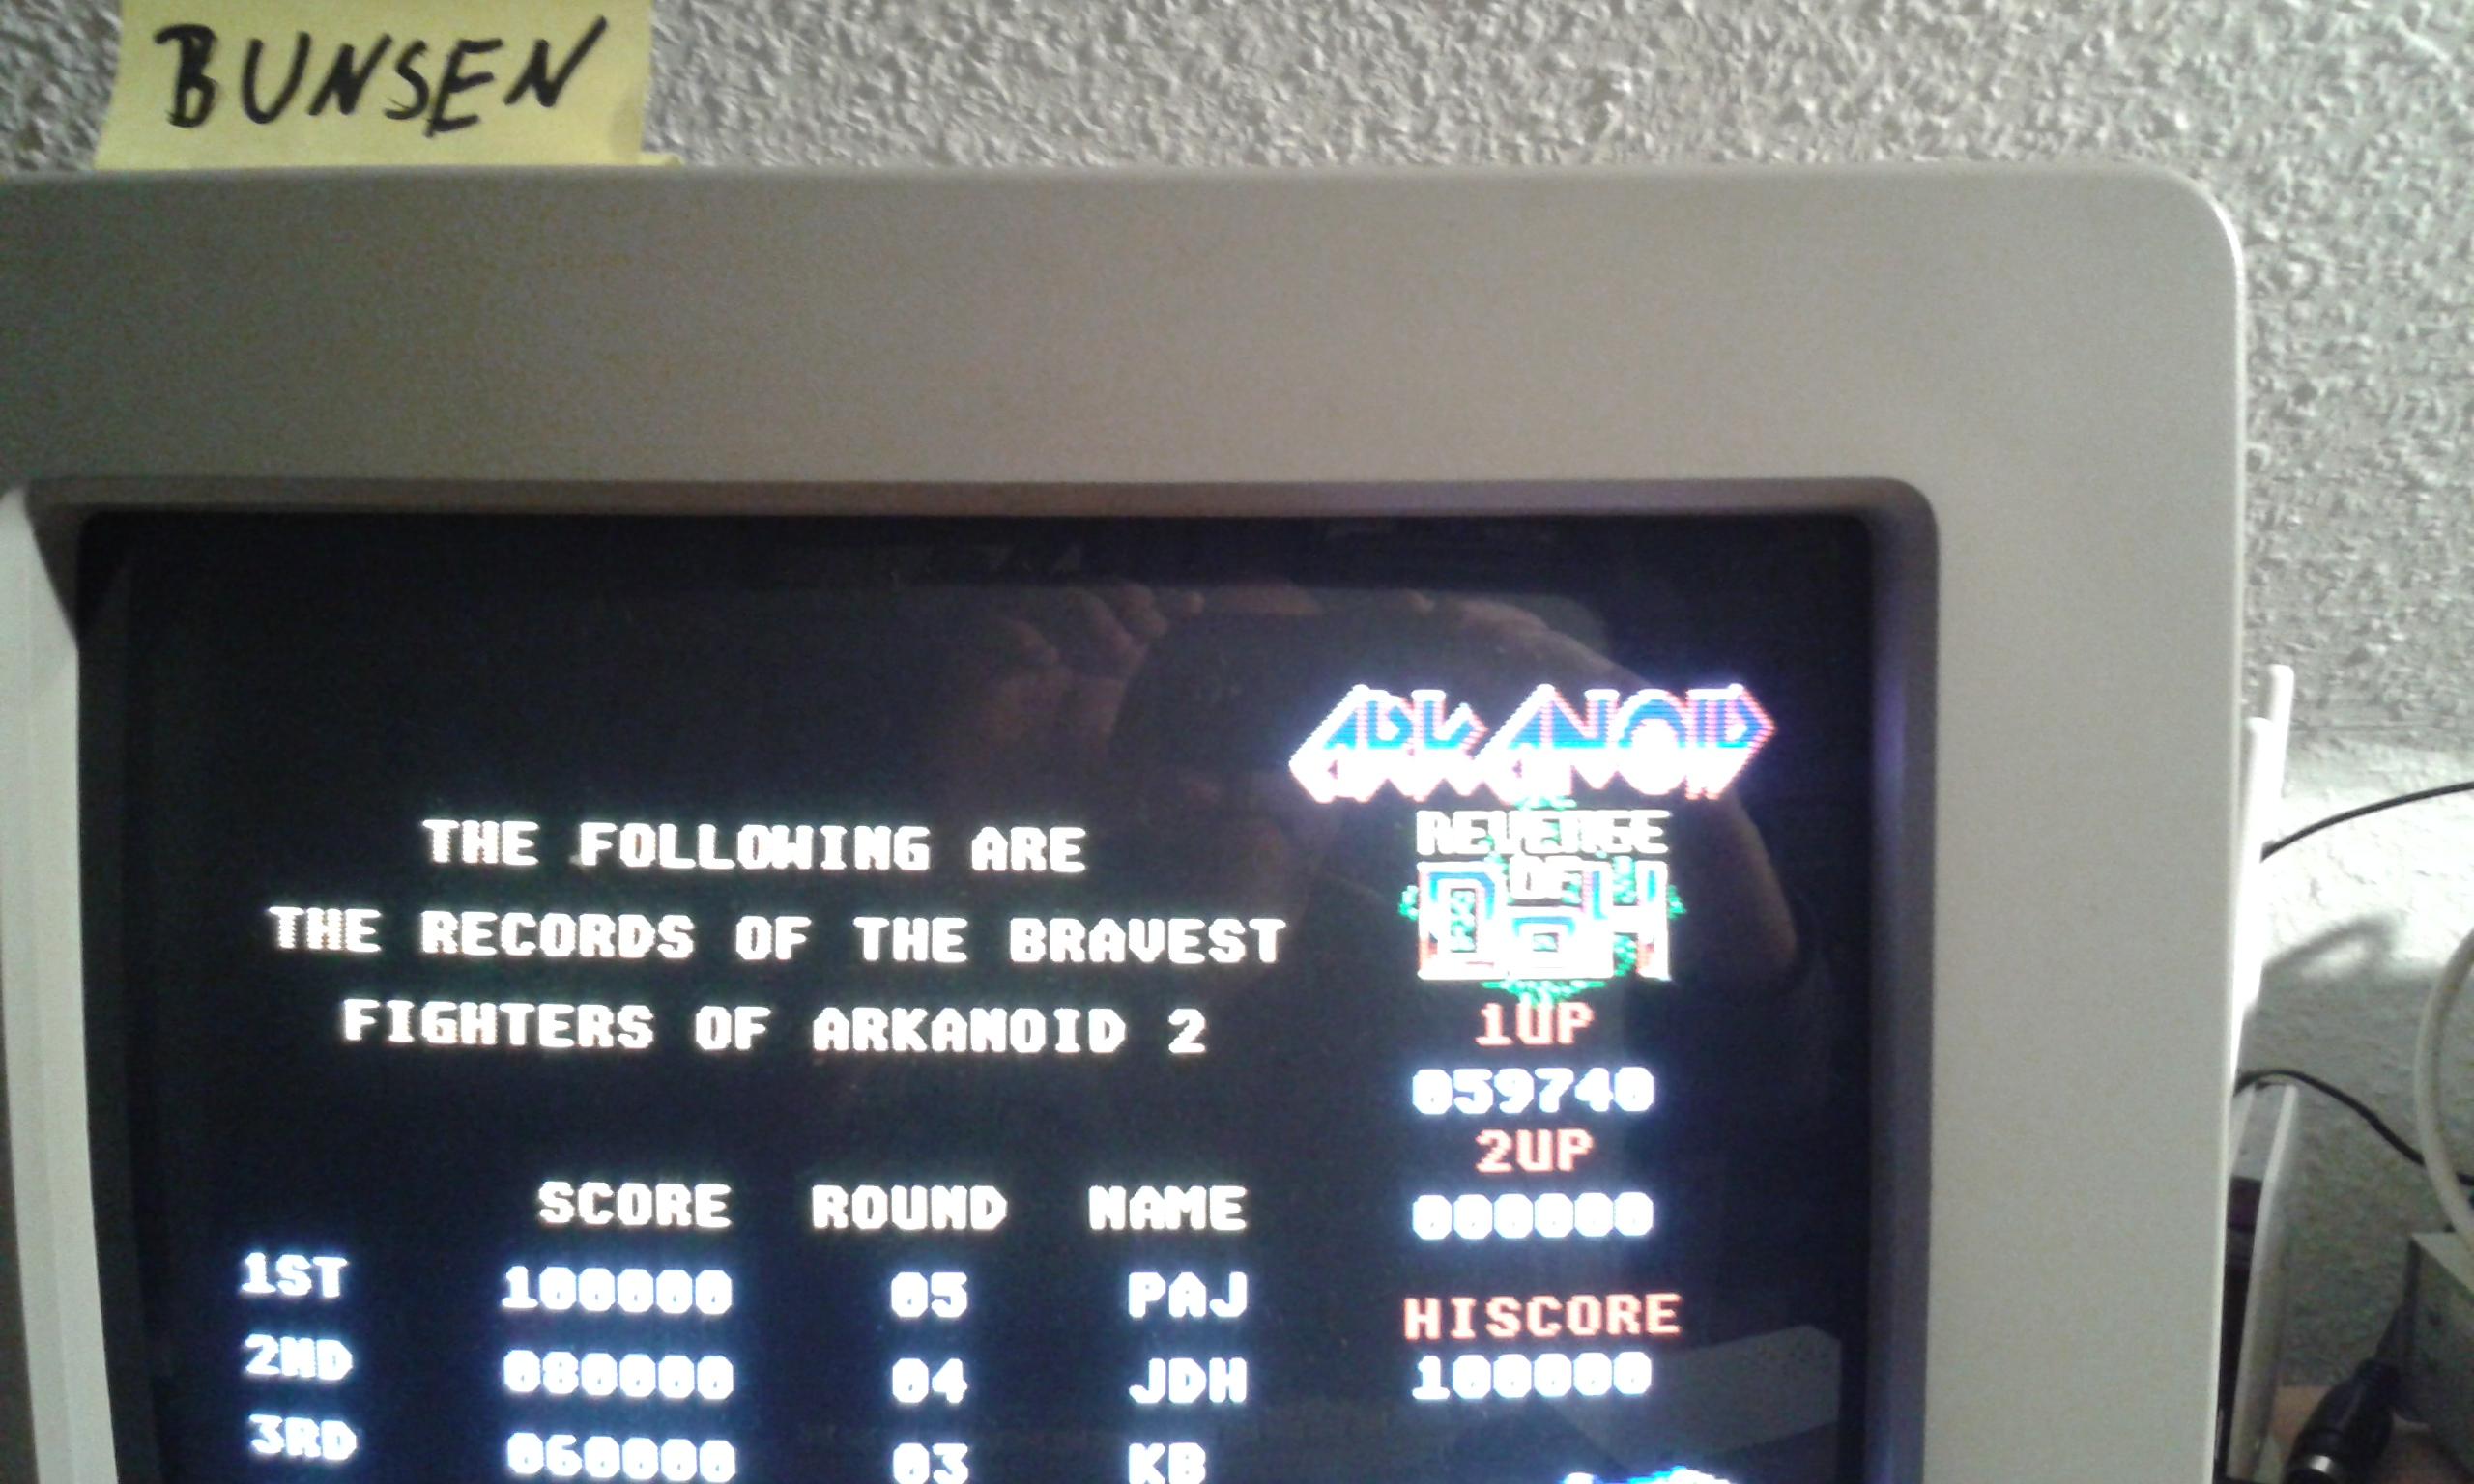 Bunsen: Arkanoid: Revenge of Doh (Atari ST) 59,740 points on 2015-04-24 14:47:02